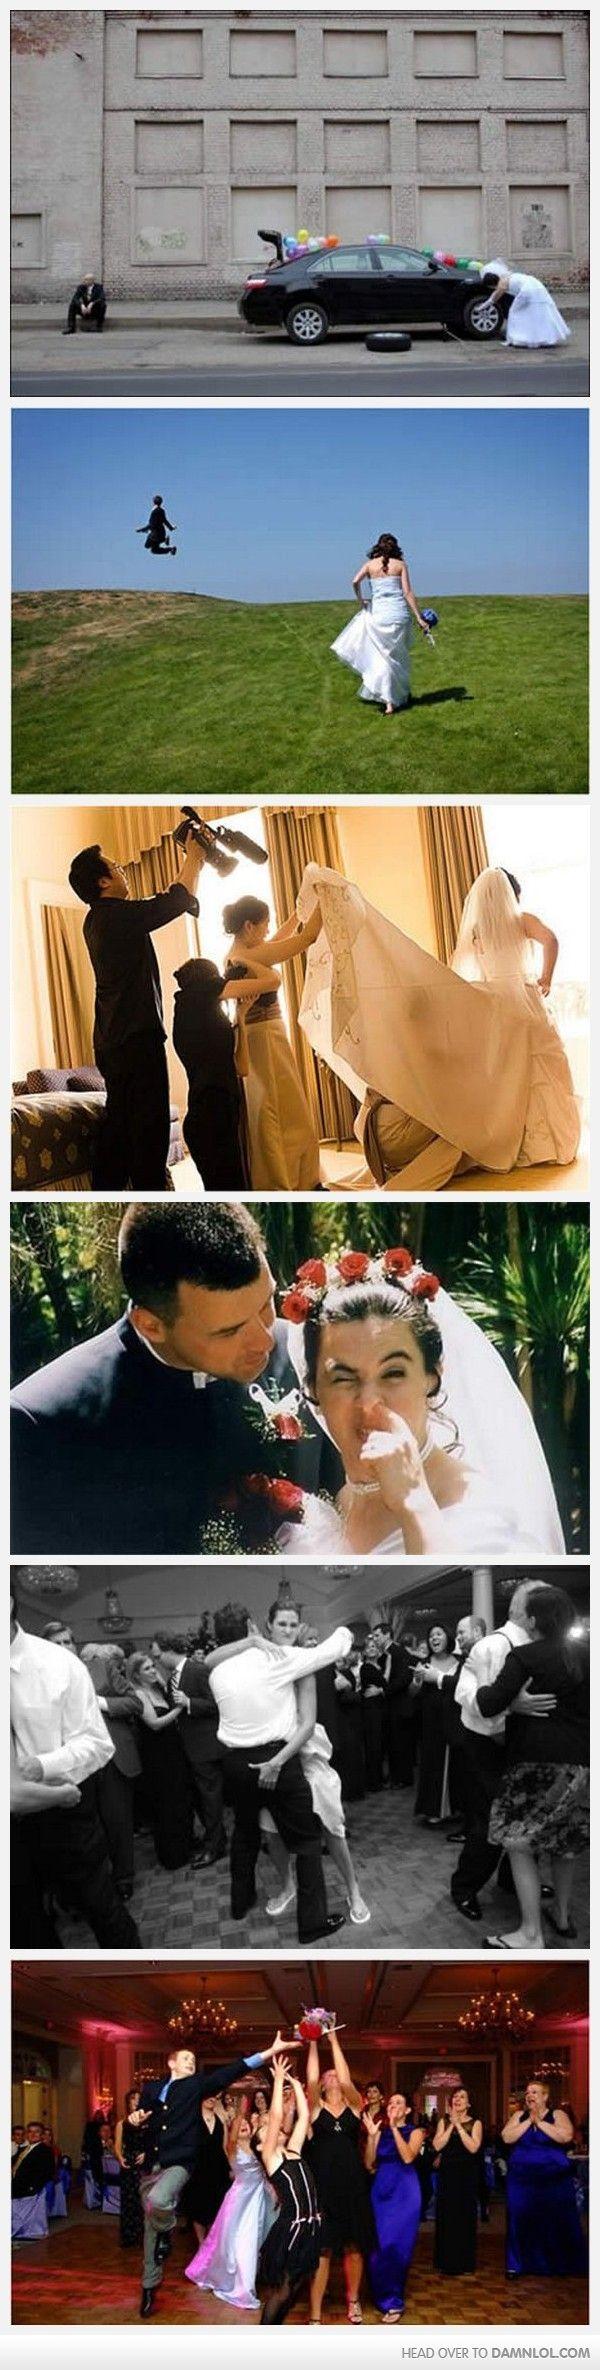 Wedding photo fails 2